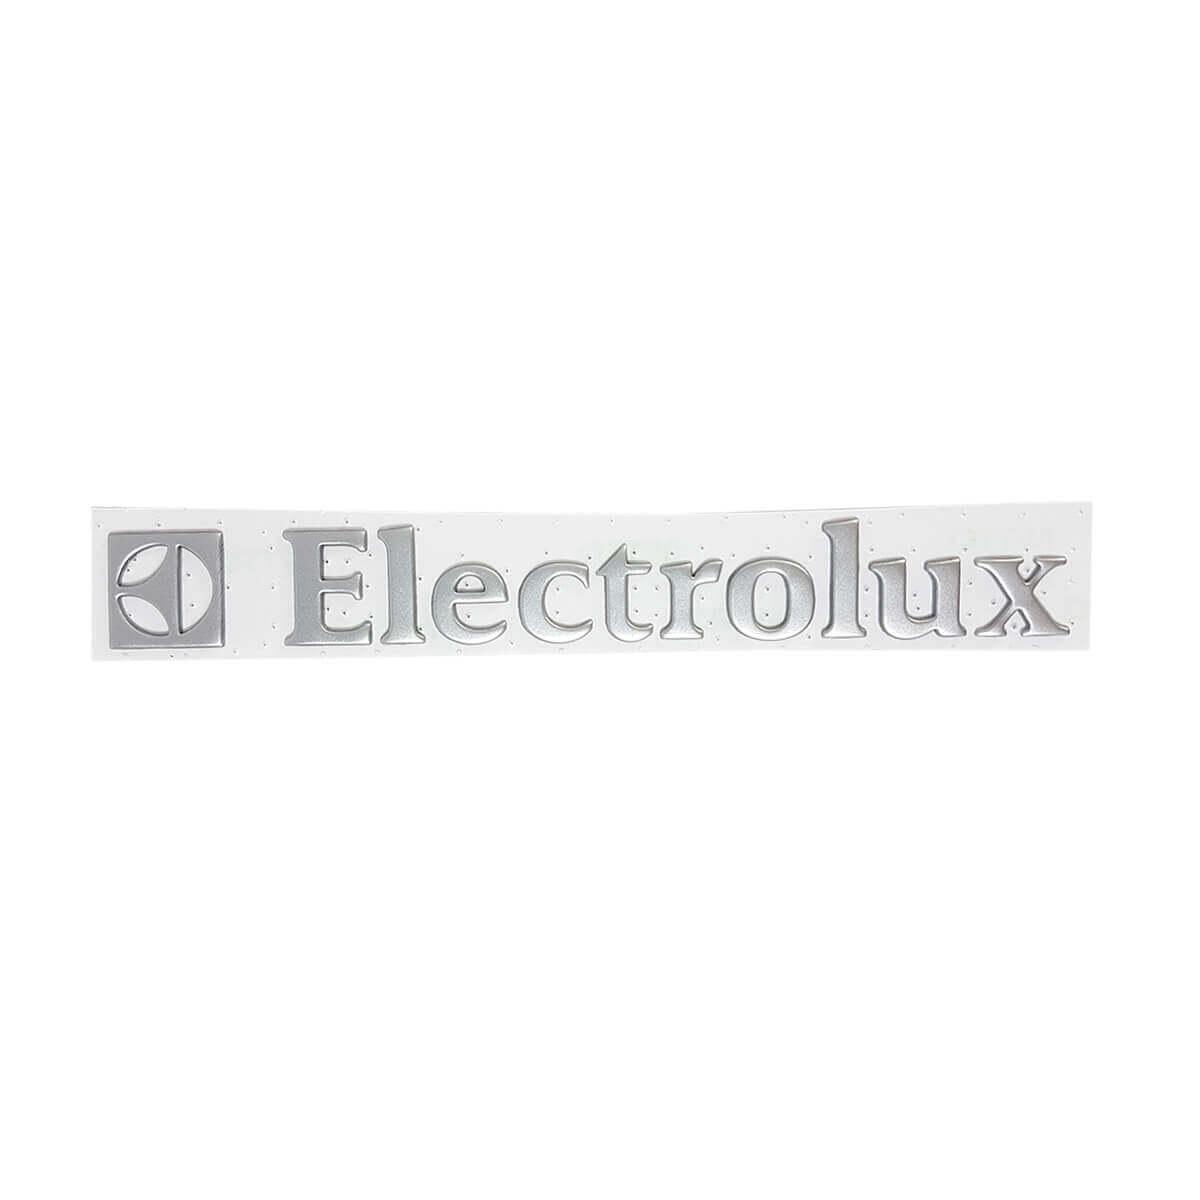 Emblema Adesivo Electrolux Para Refrigeradores - 69580635